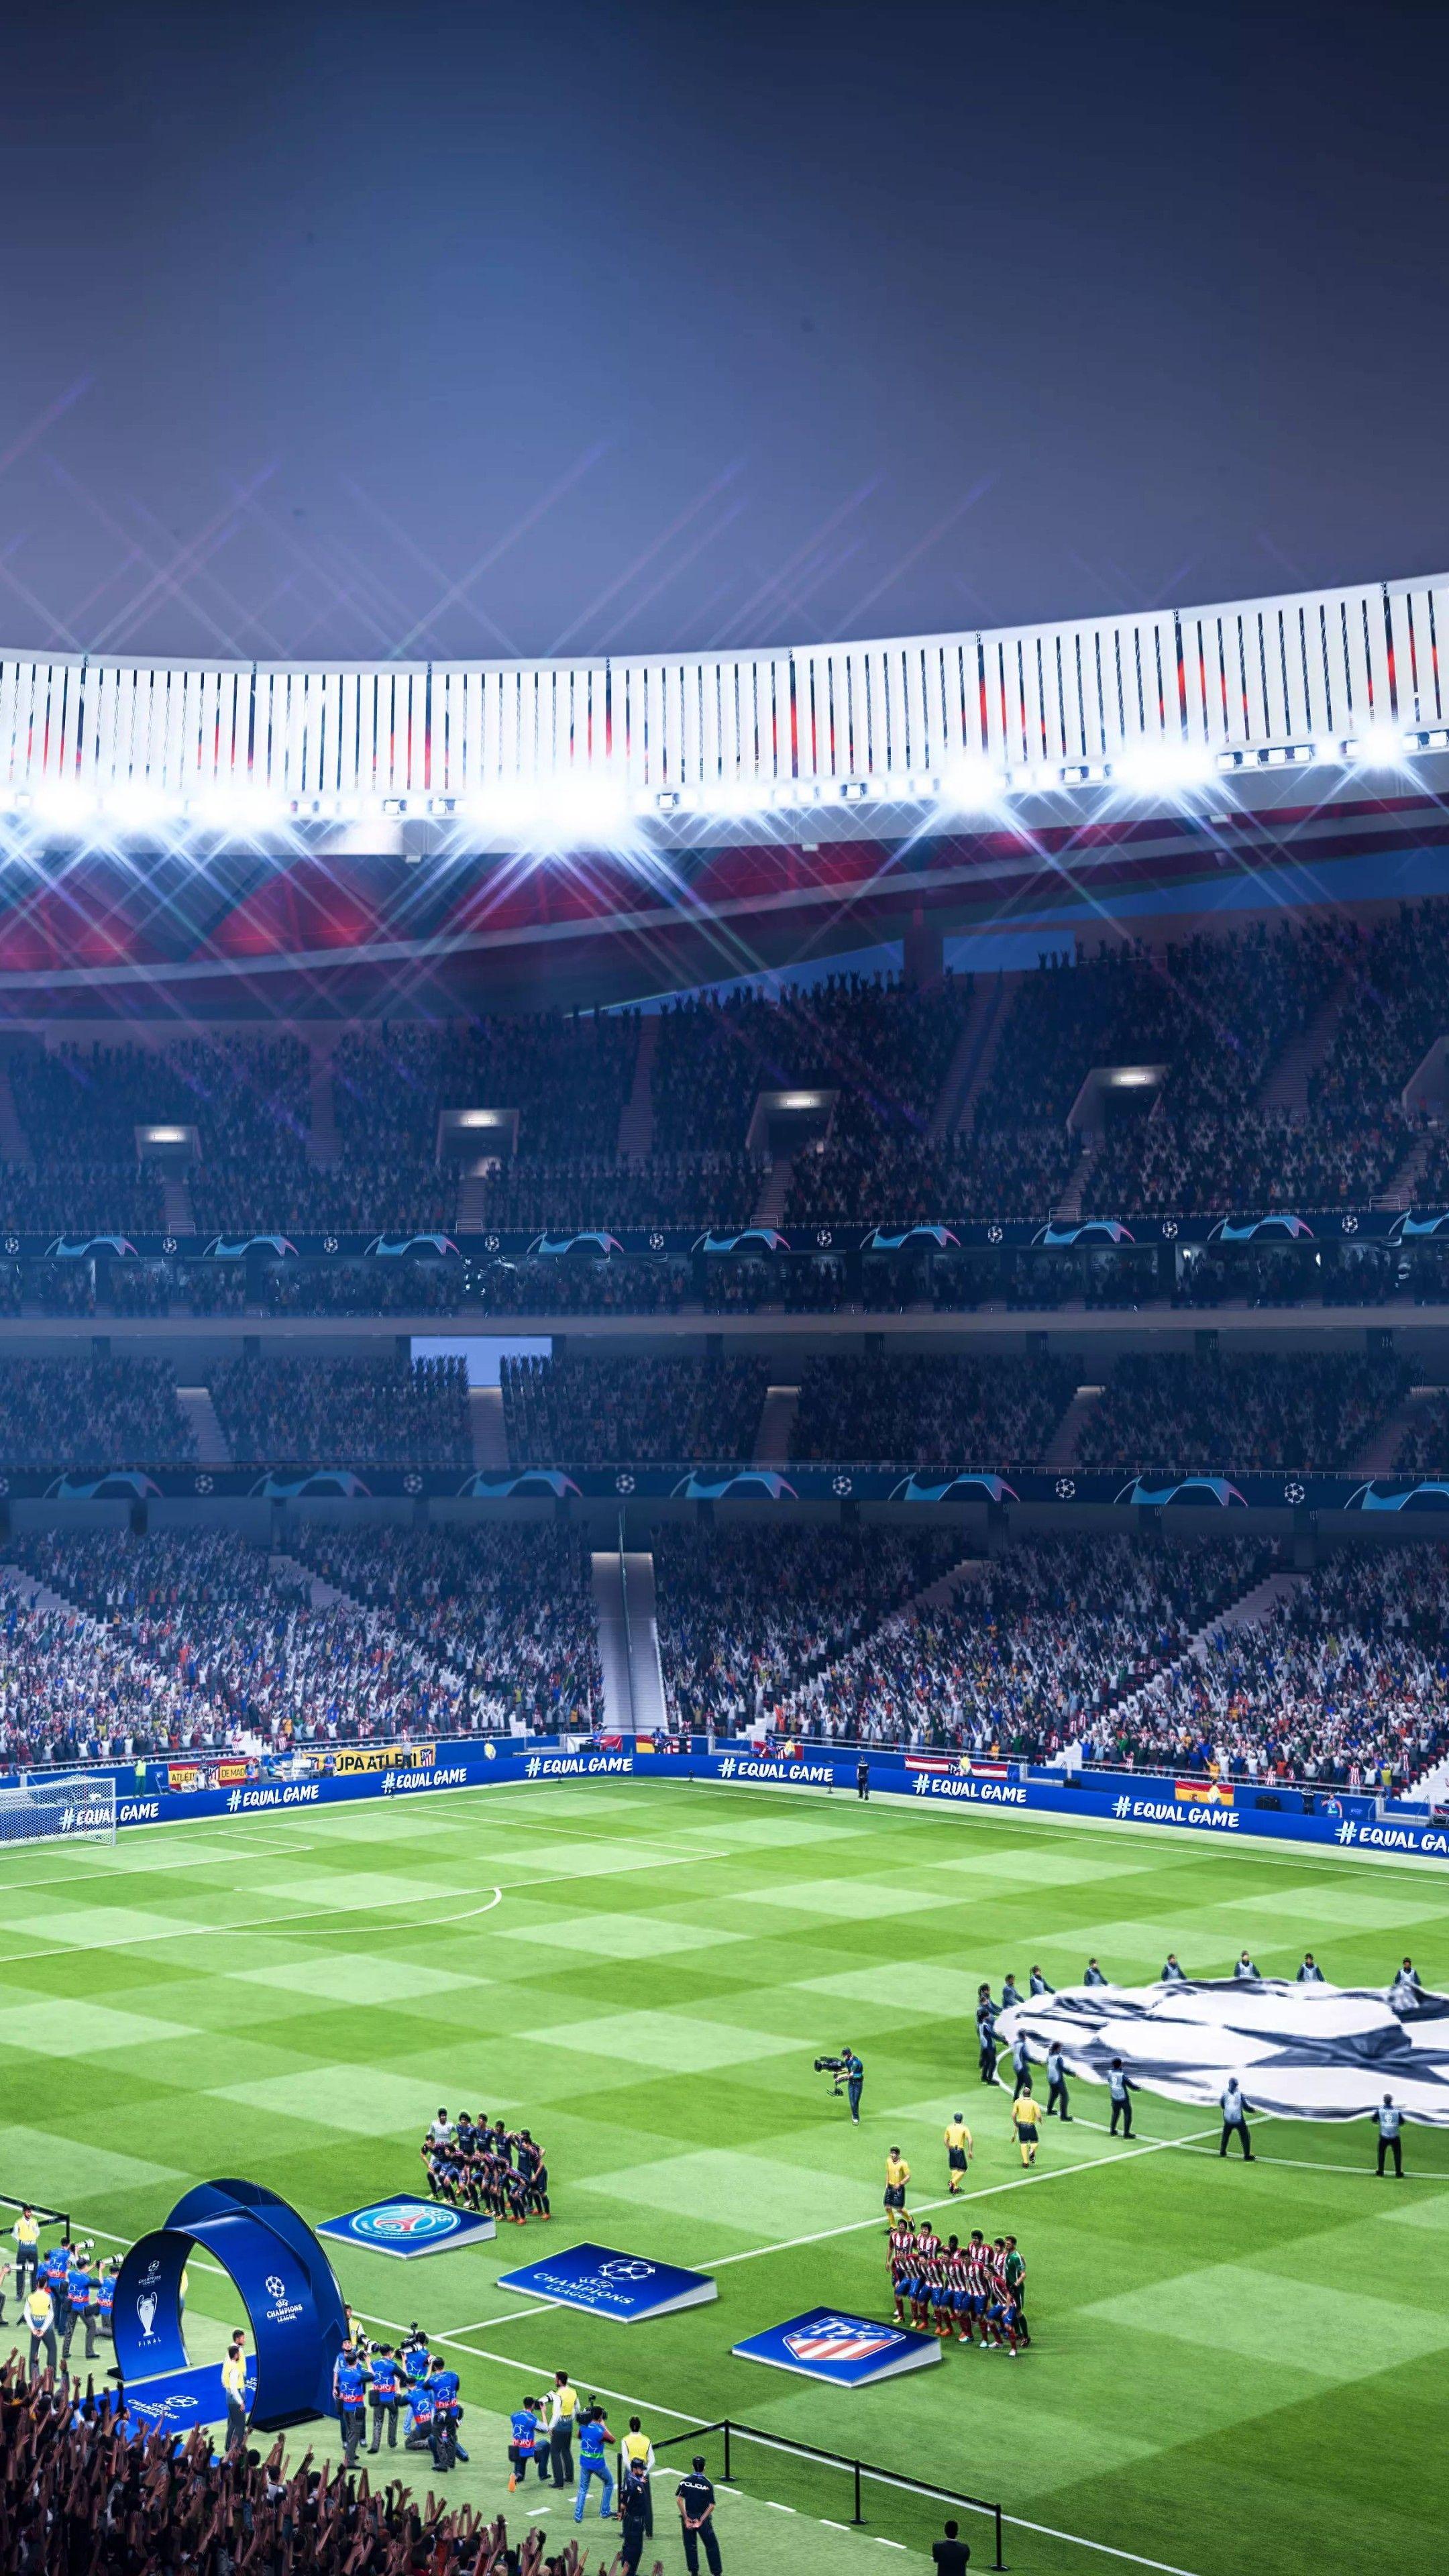 Fifa 19 Http Www Wallpaperback Net Games Fifa 19 2 Html 8k E3 2018 Screenshot Fifa Neymar Jr Wallpapers Games